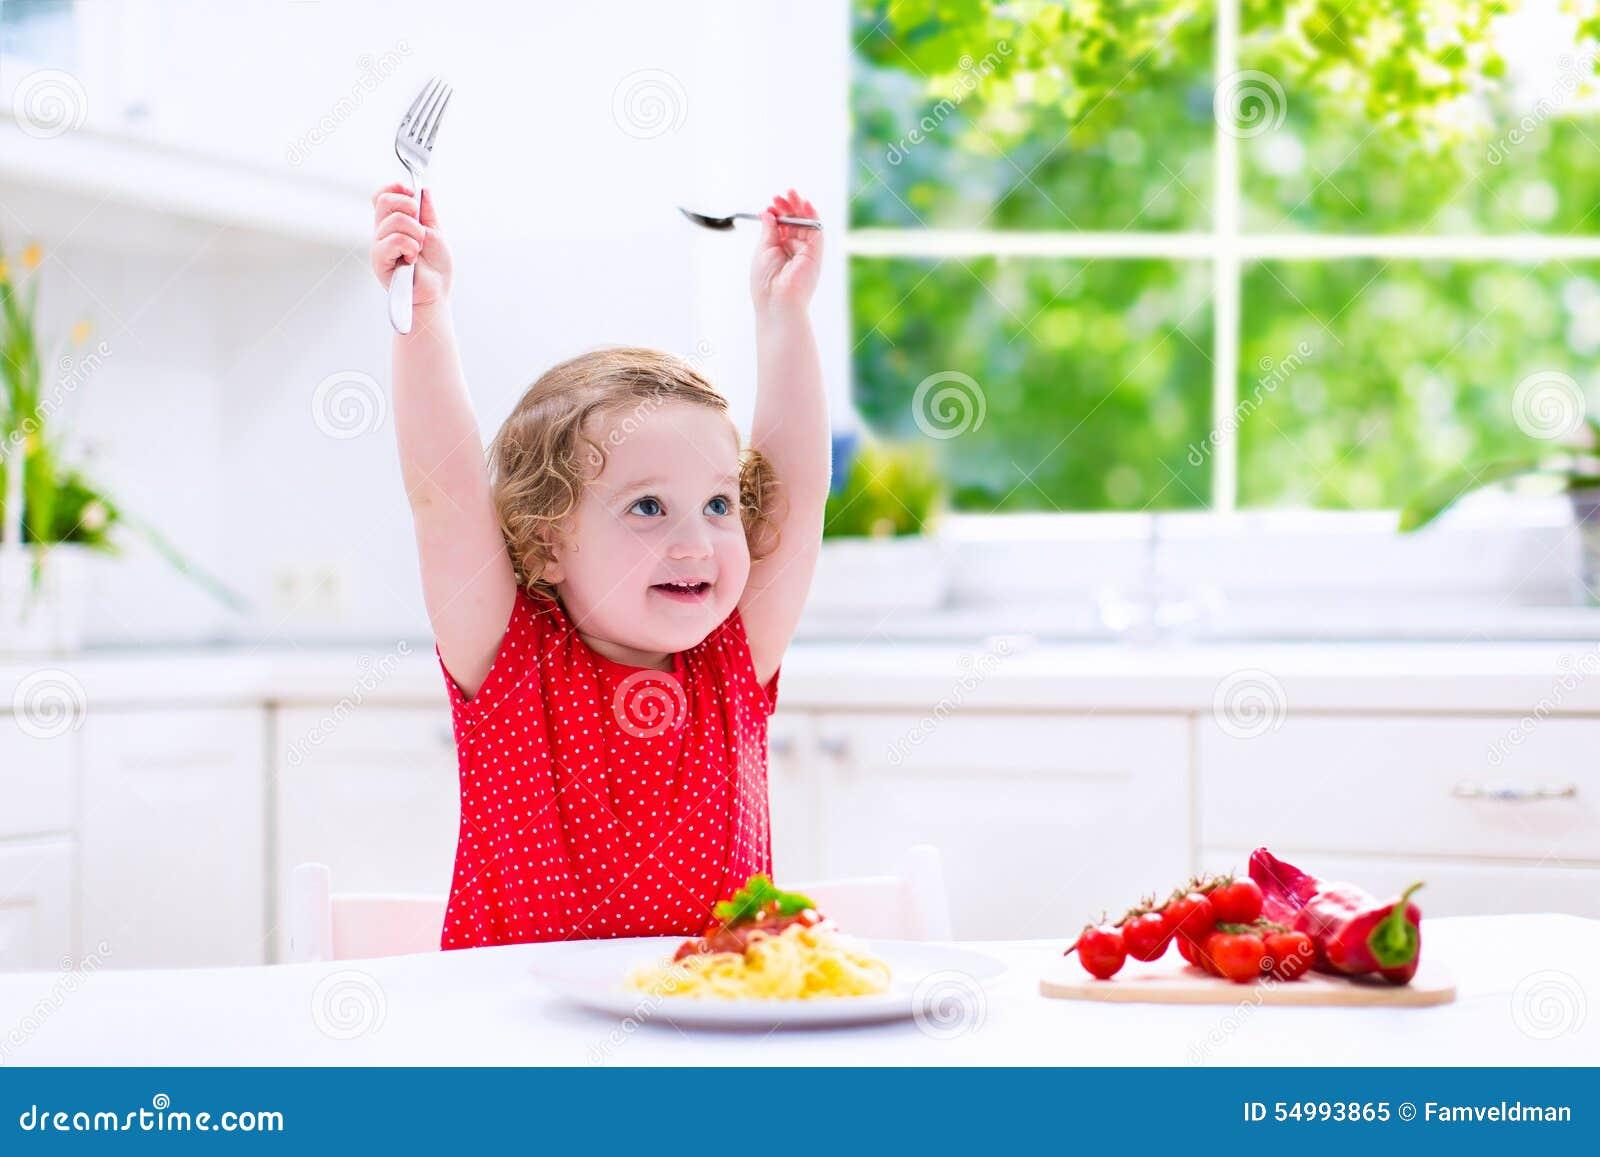 Beautiful child eating pasta